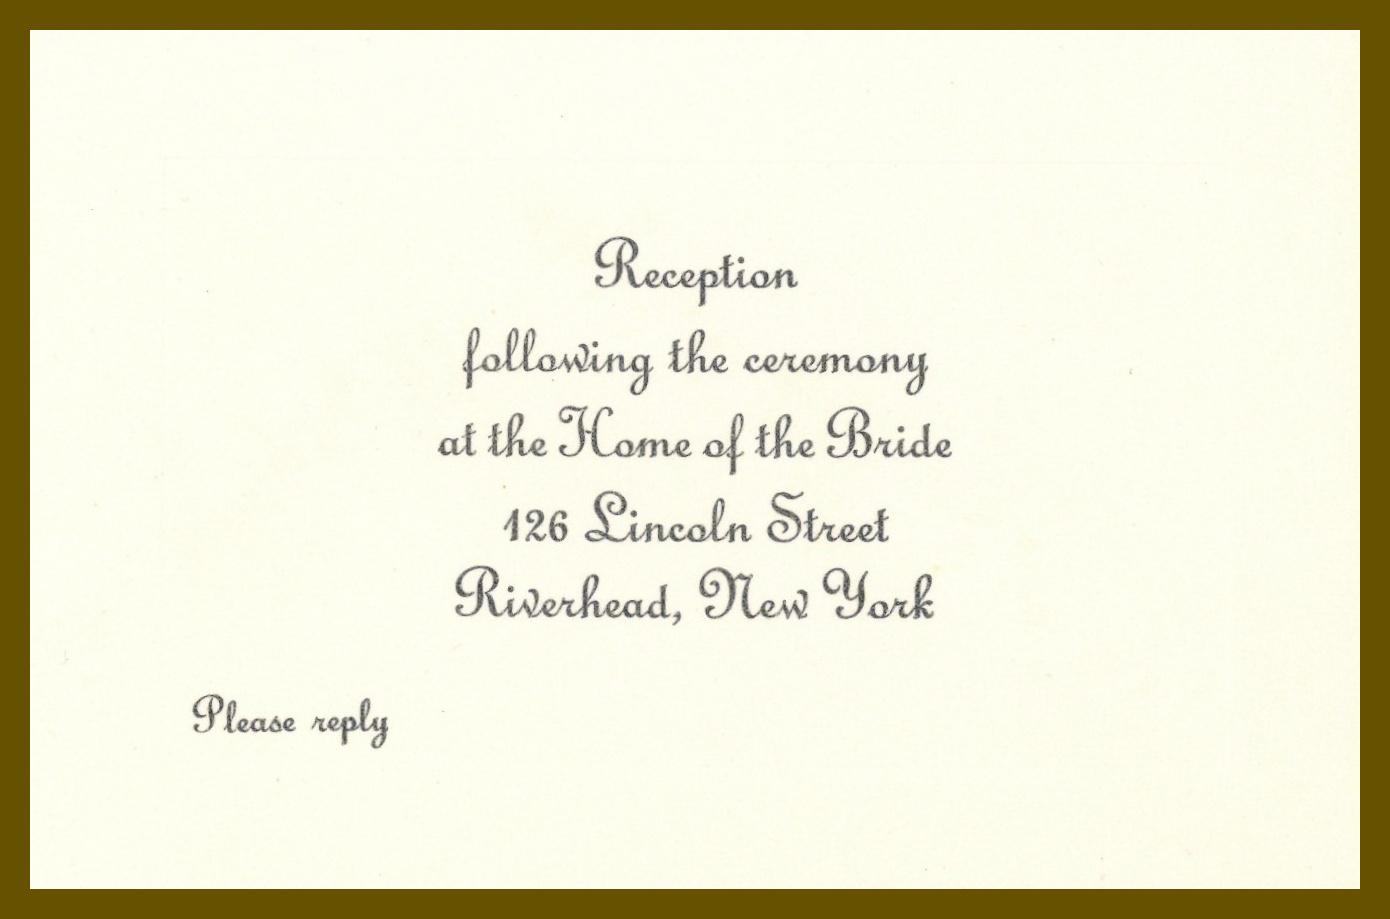 Invitation Note For Wedding: Wedding Reception Invitation Letter. Invitation Letter To